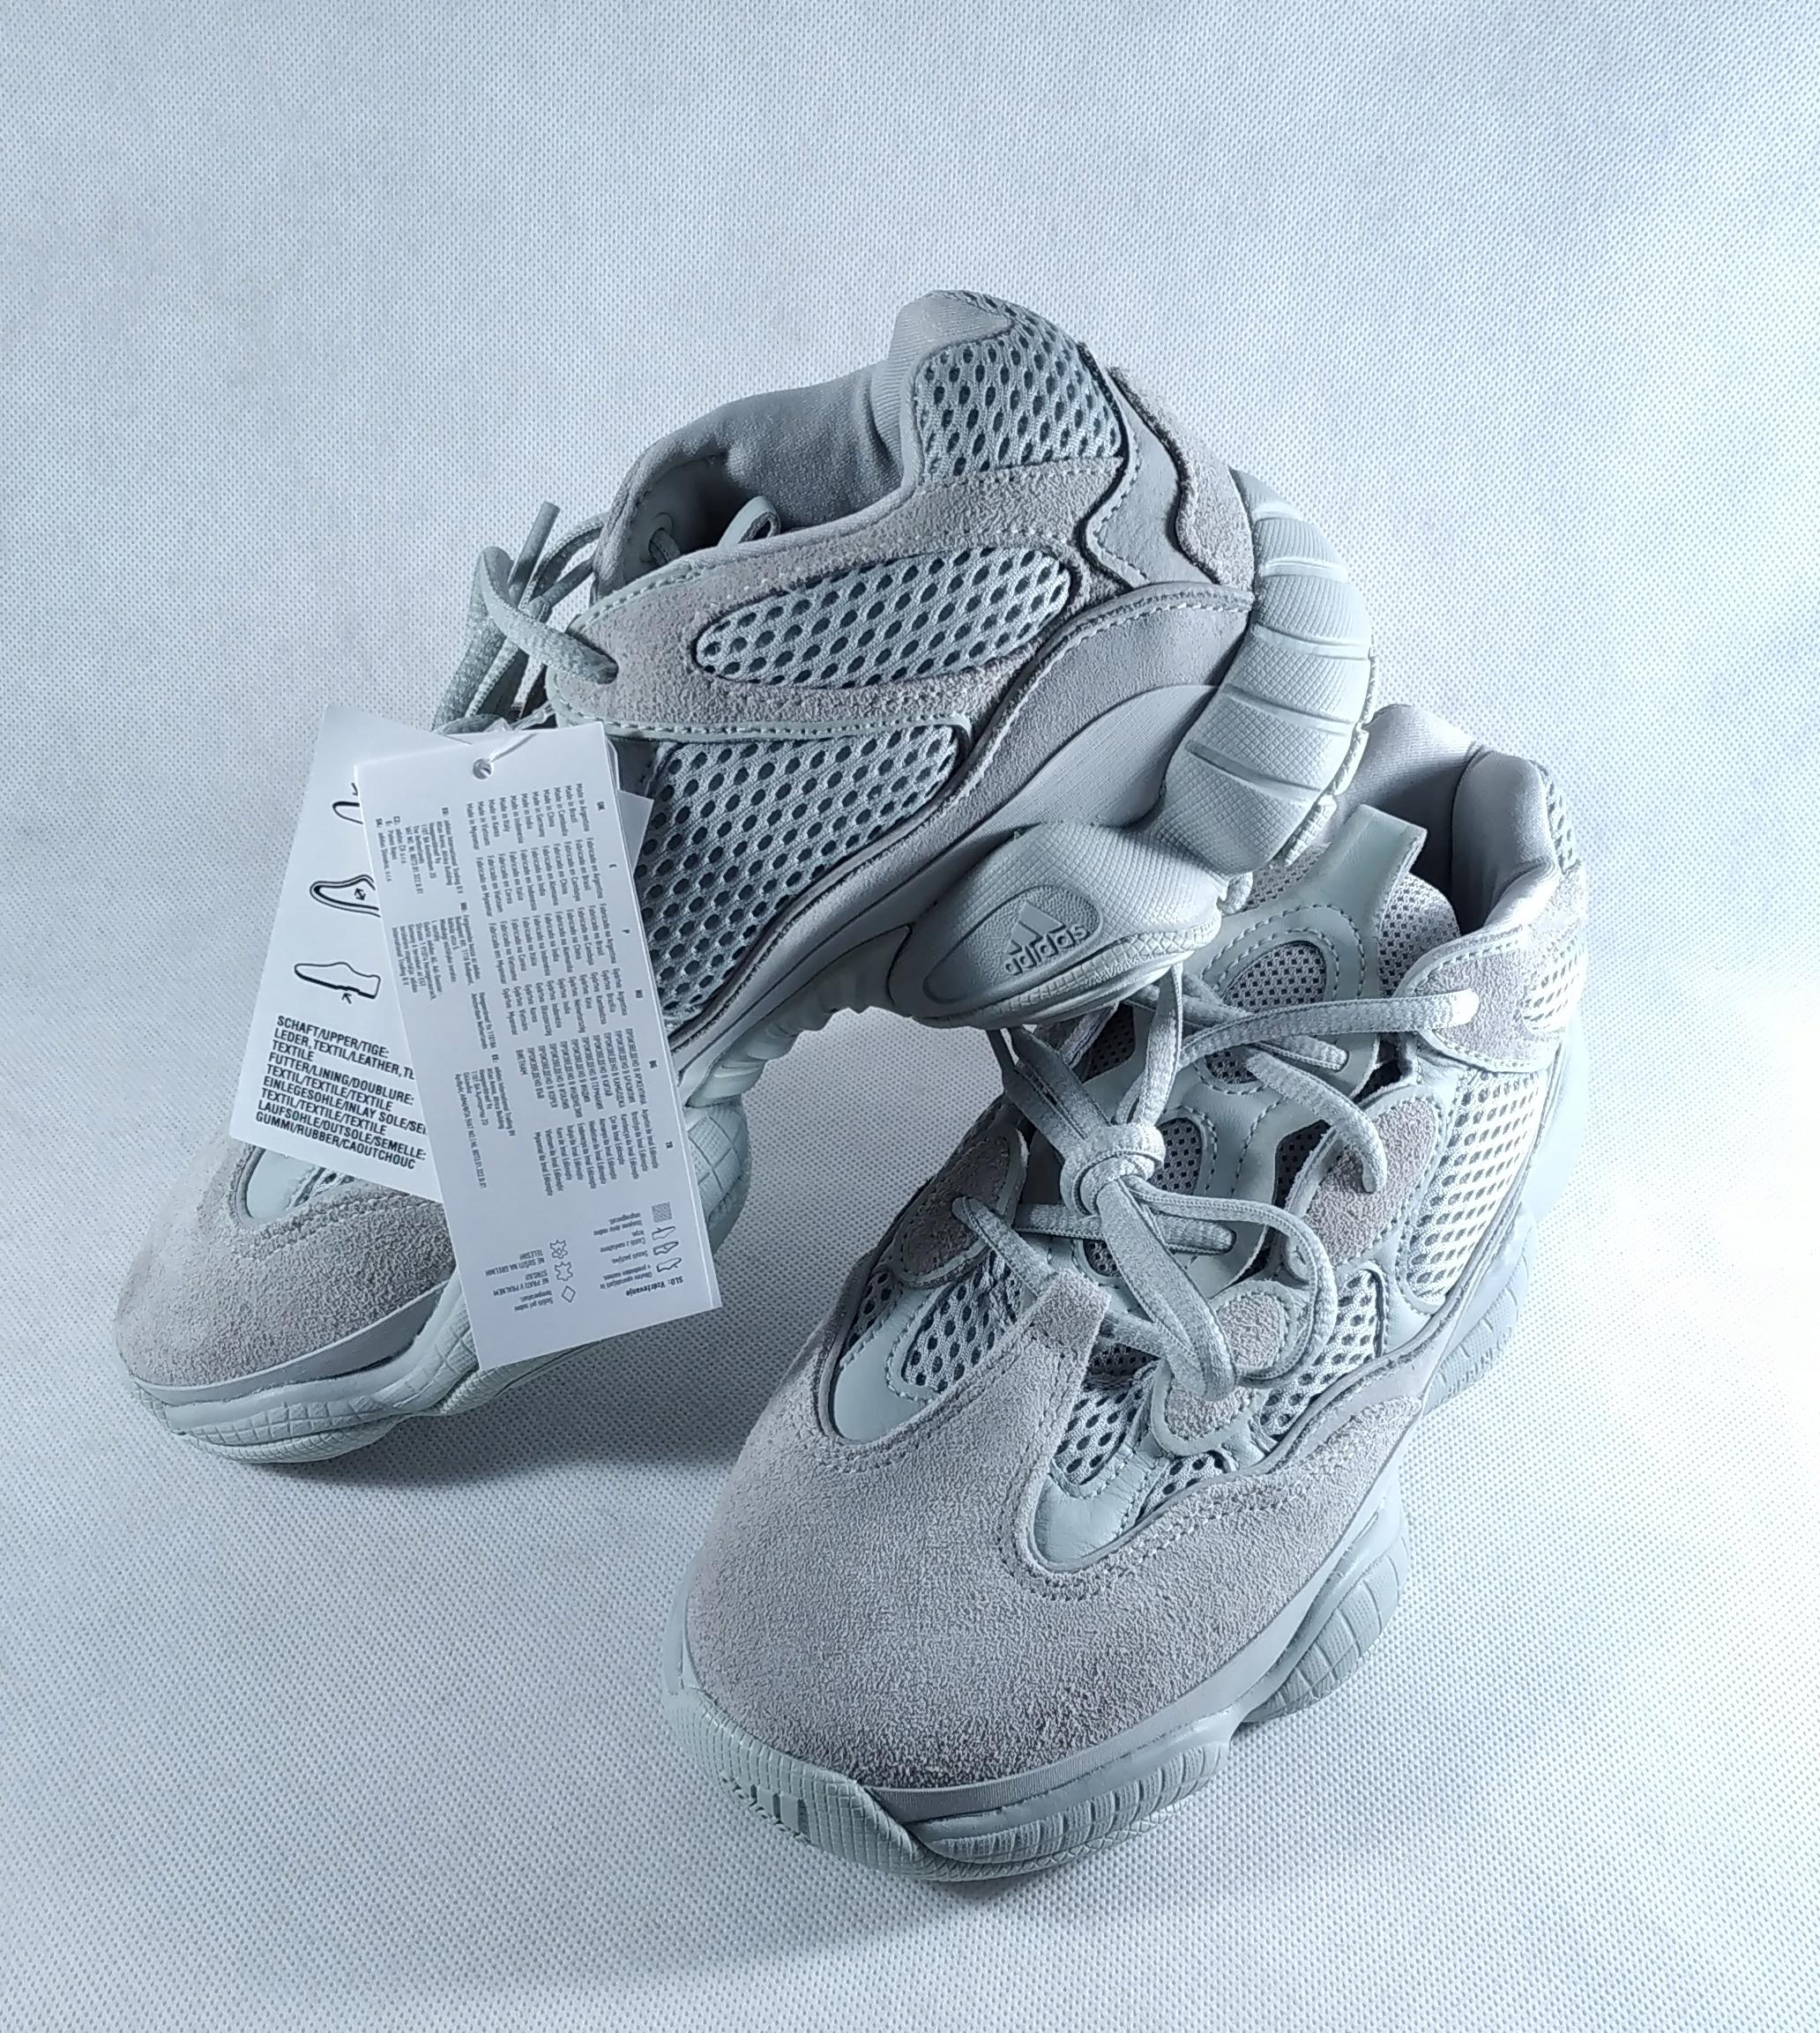 separation shoes d00d5 e2235 Buty Adidas Adidas Yeezy 500 39,5 - 7699345603 - oficjalne ...